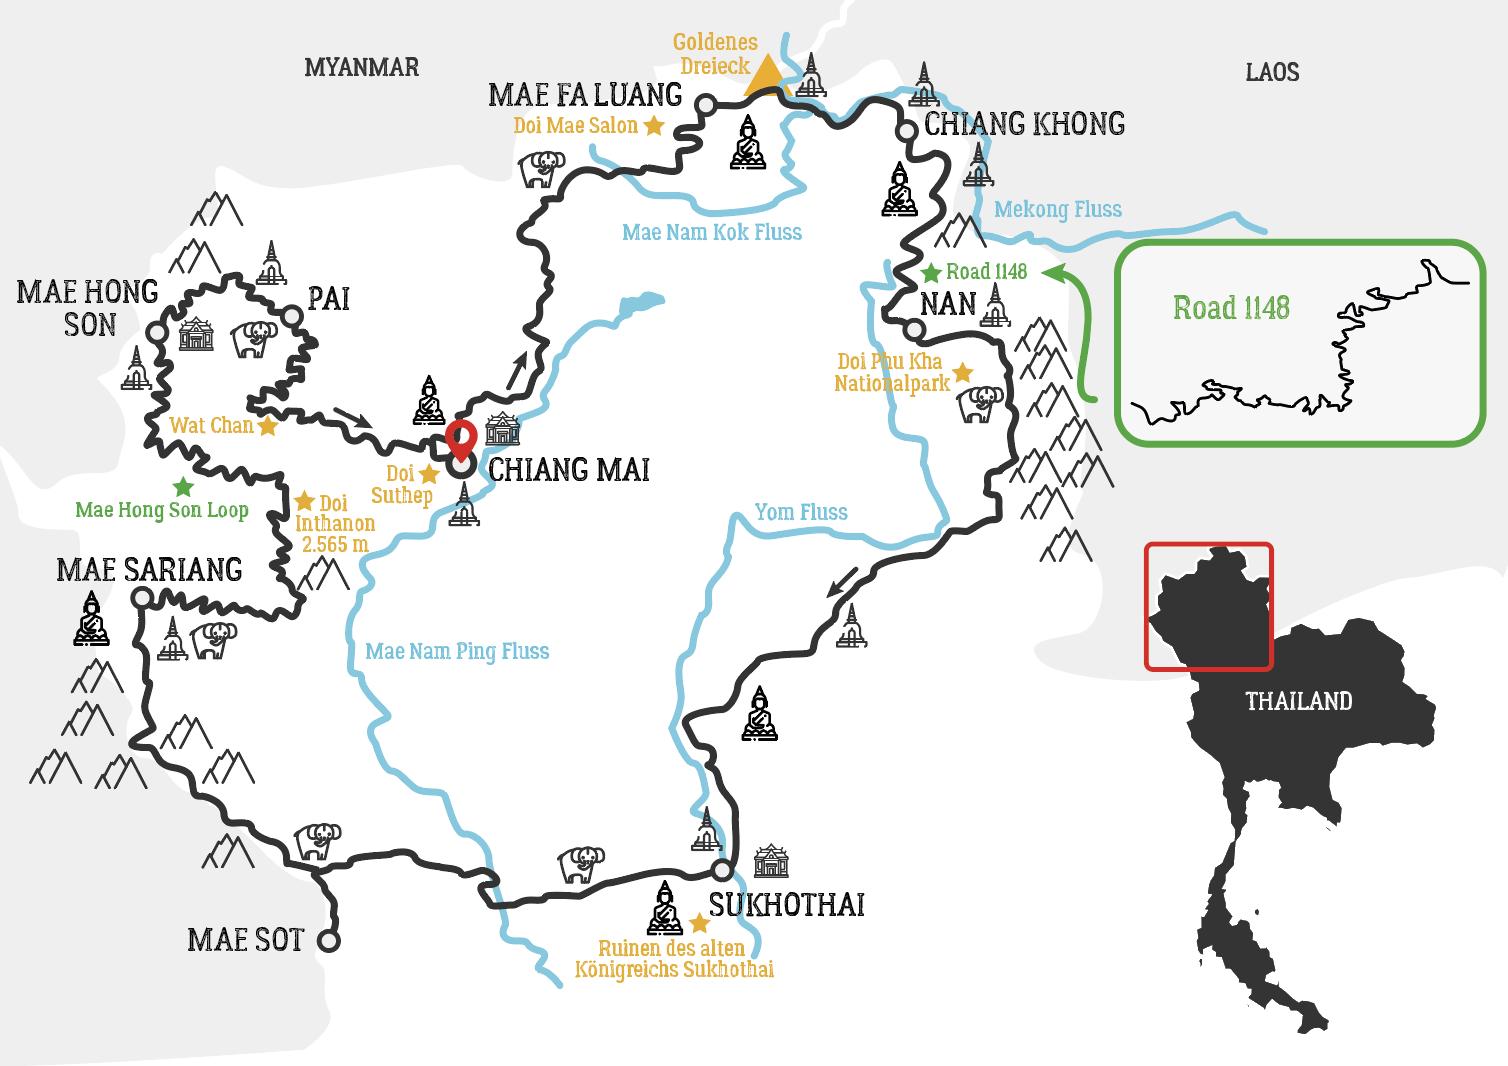 Thailand Goldenes Dreieck Motorradtour Karte